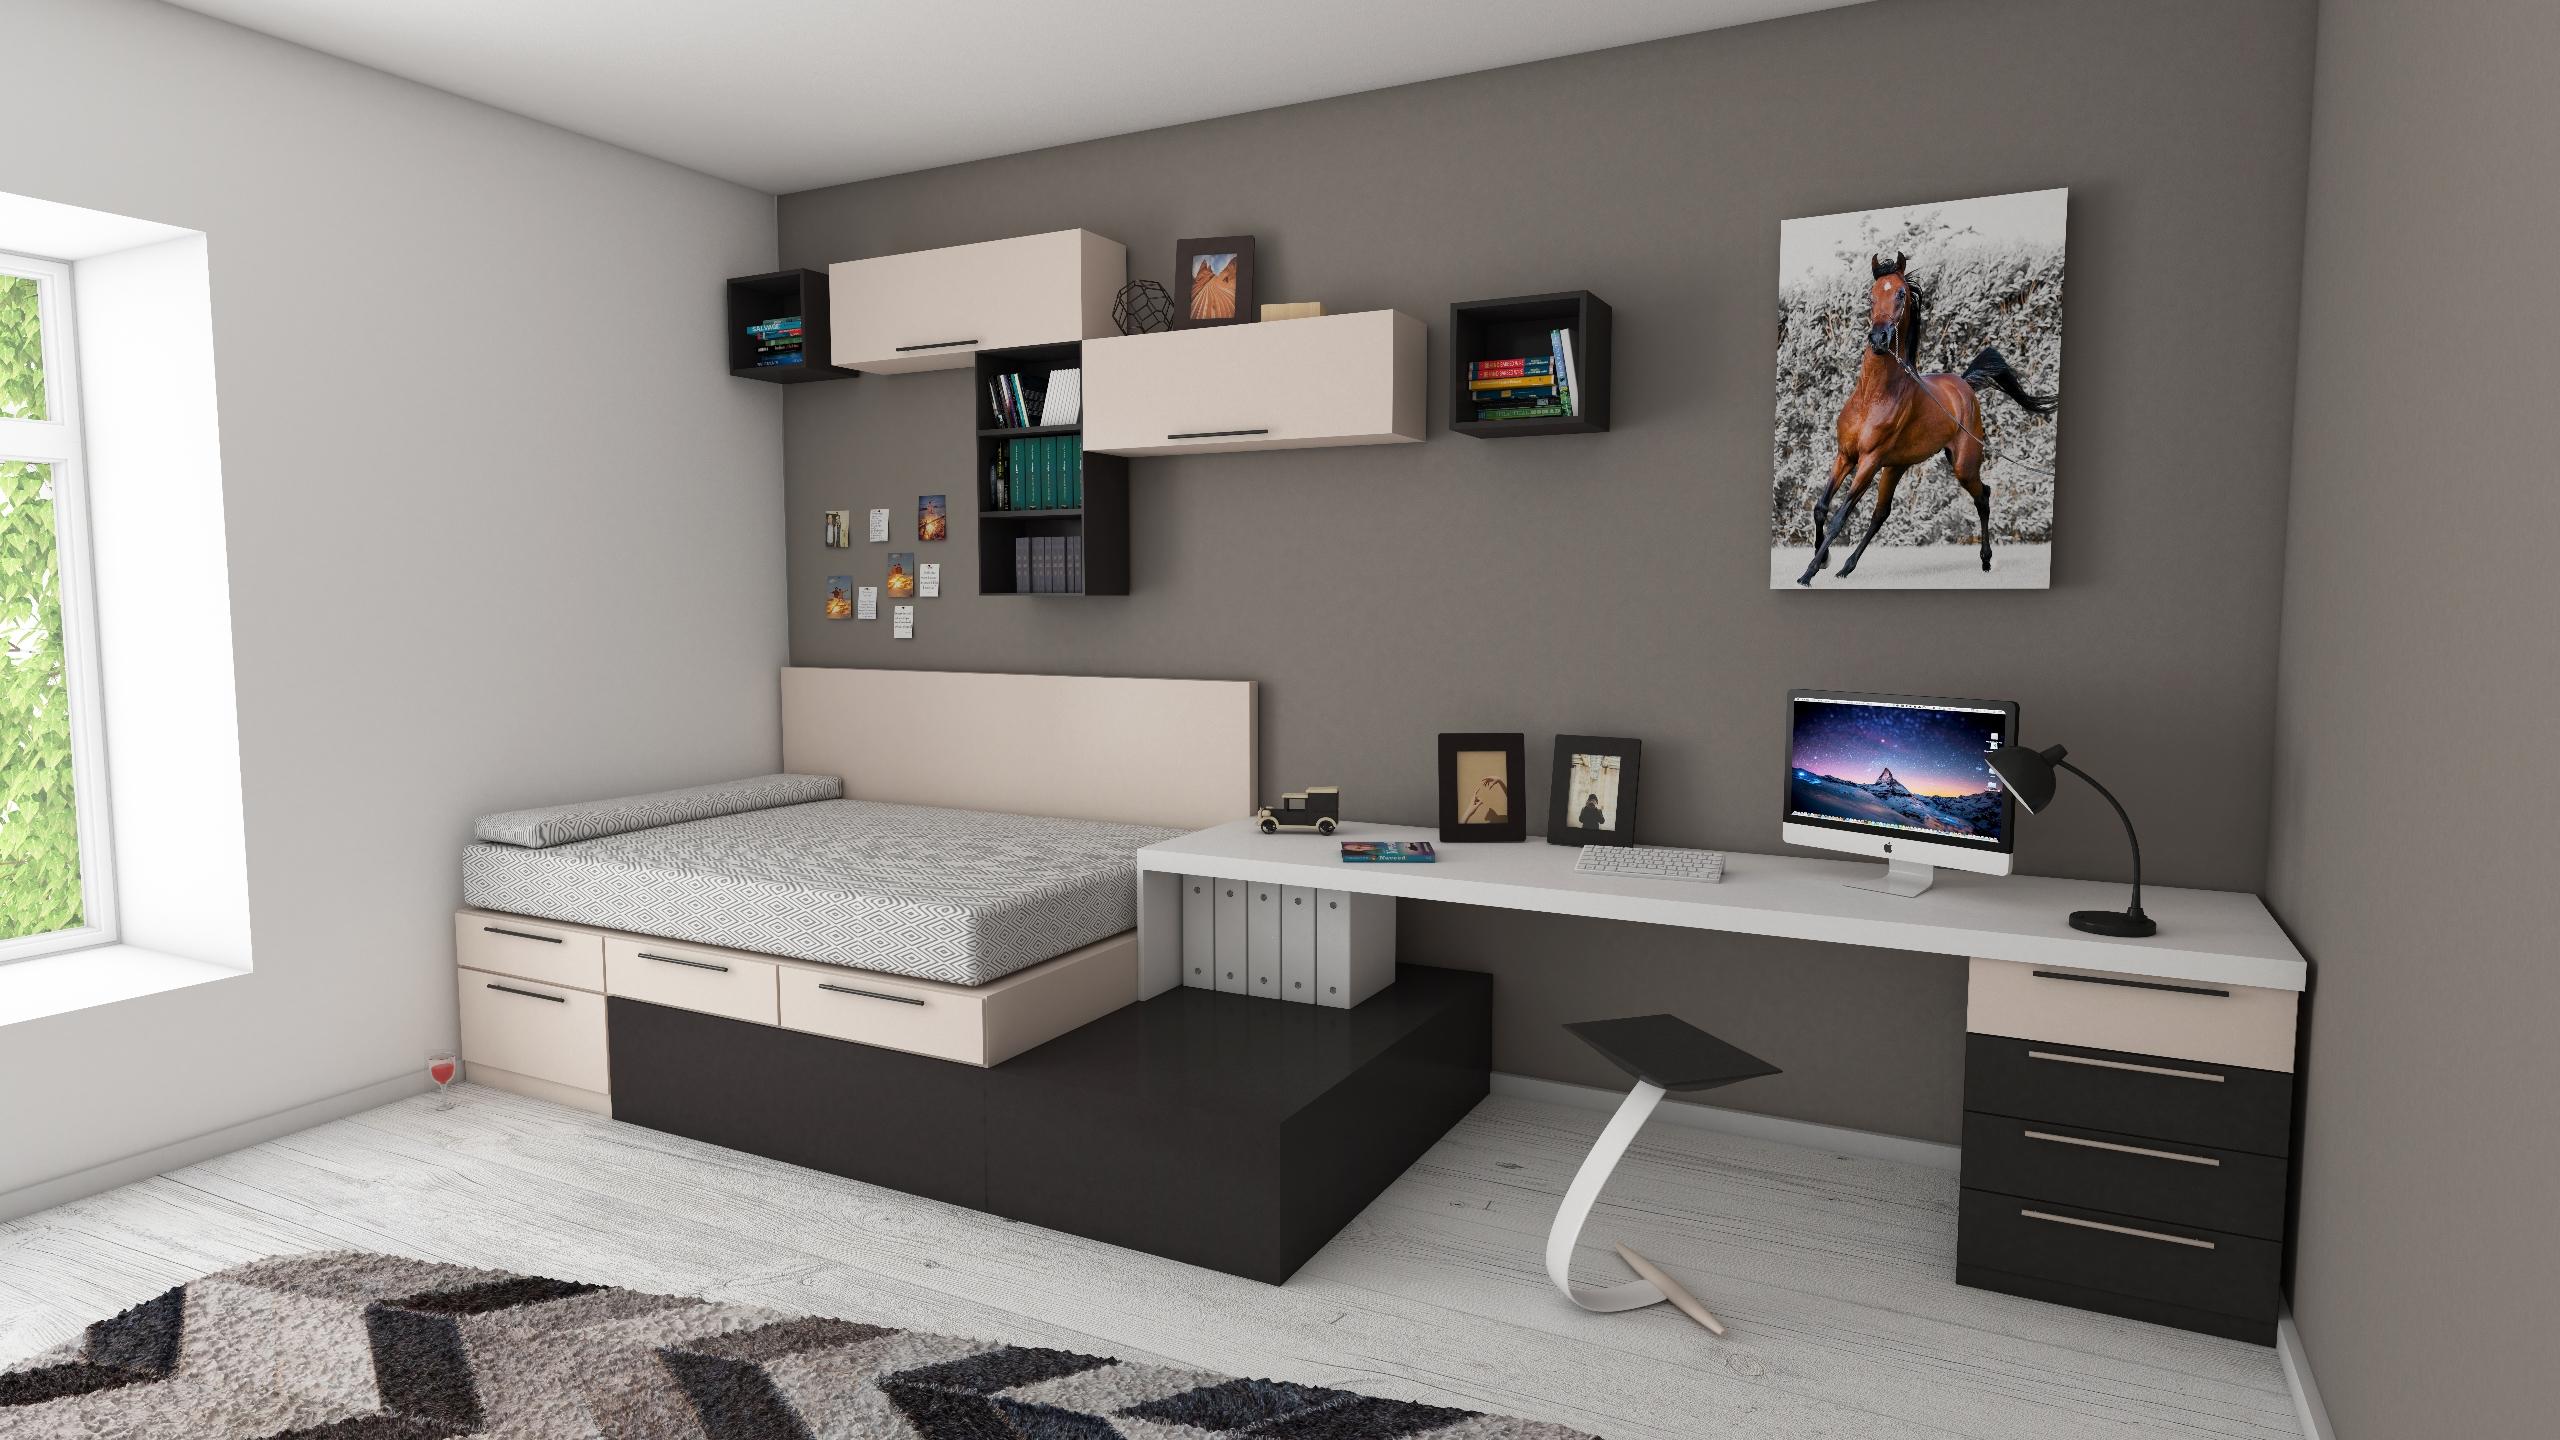 Tony Ryan Tonybeerpizza Ello - Ello bedroom furniture